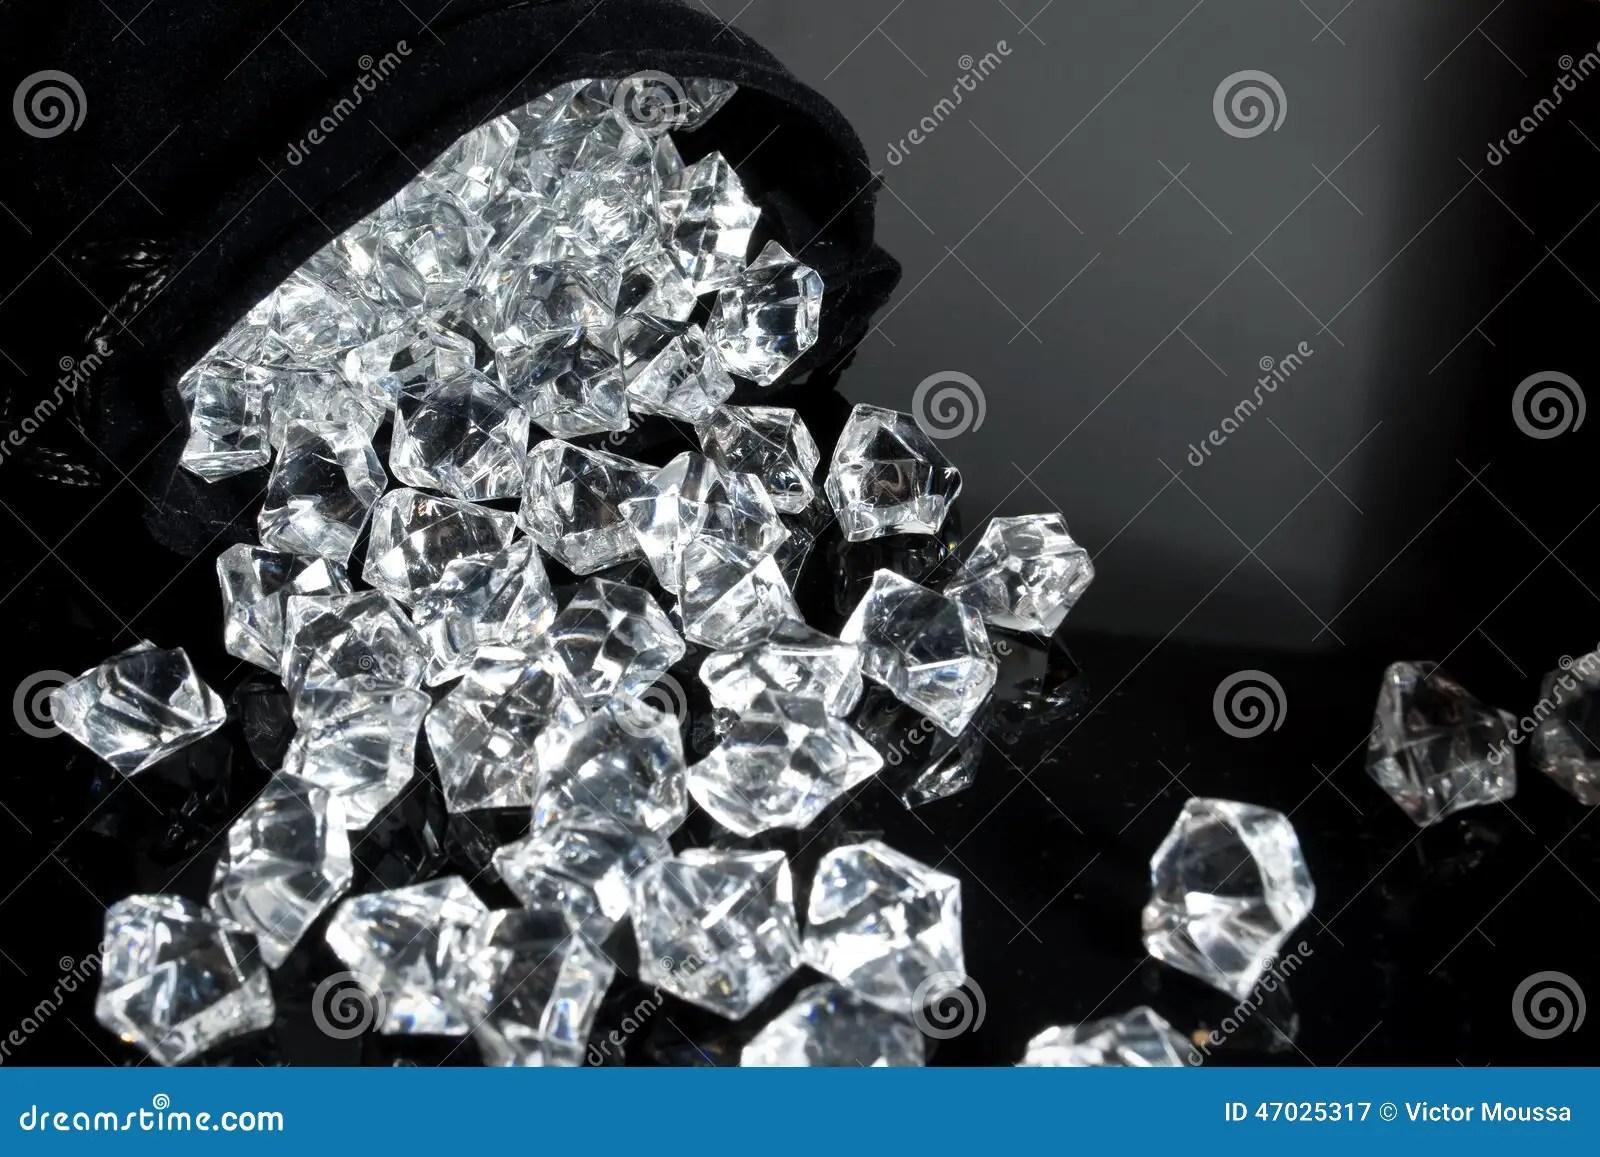 Bag Of Diamonds Stock Photo  Image 47025317